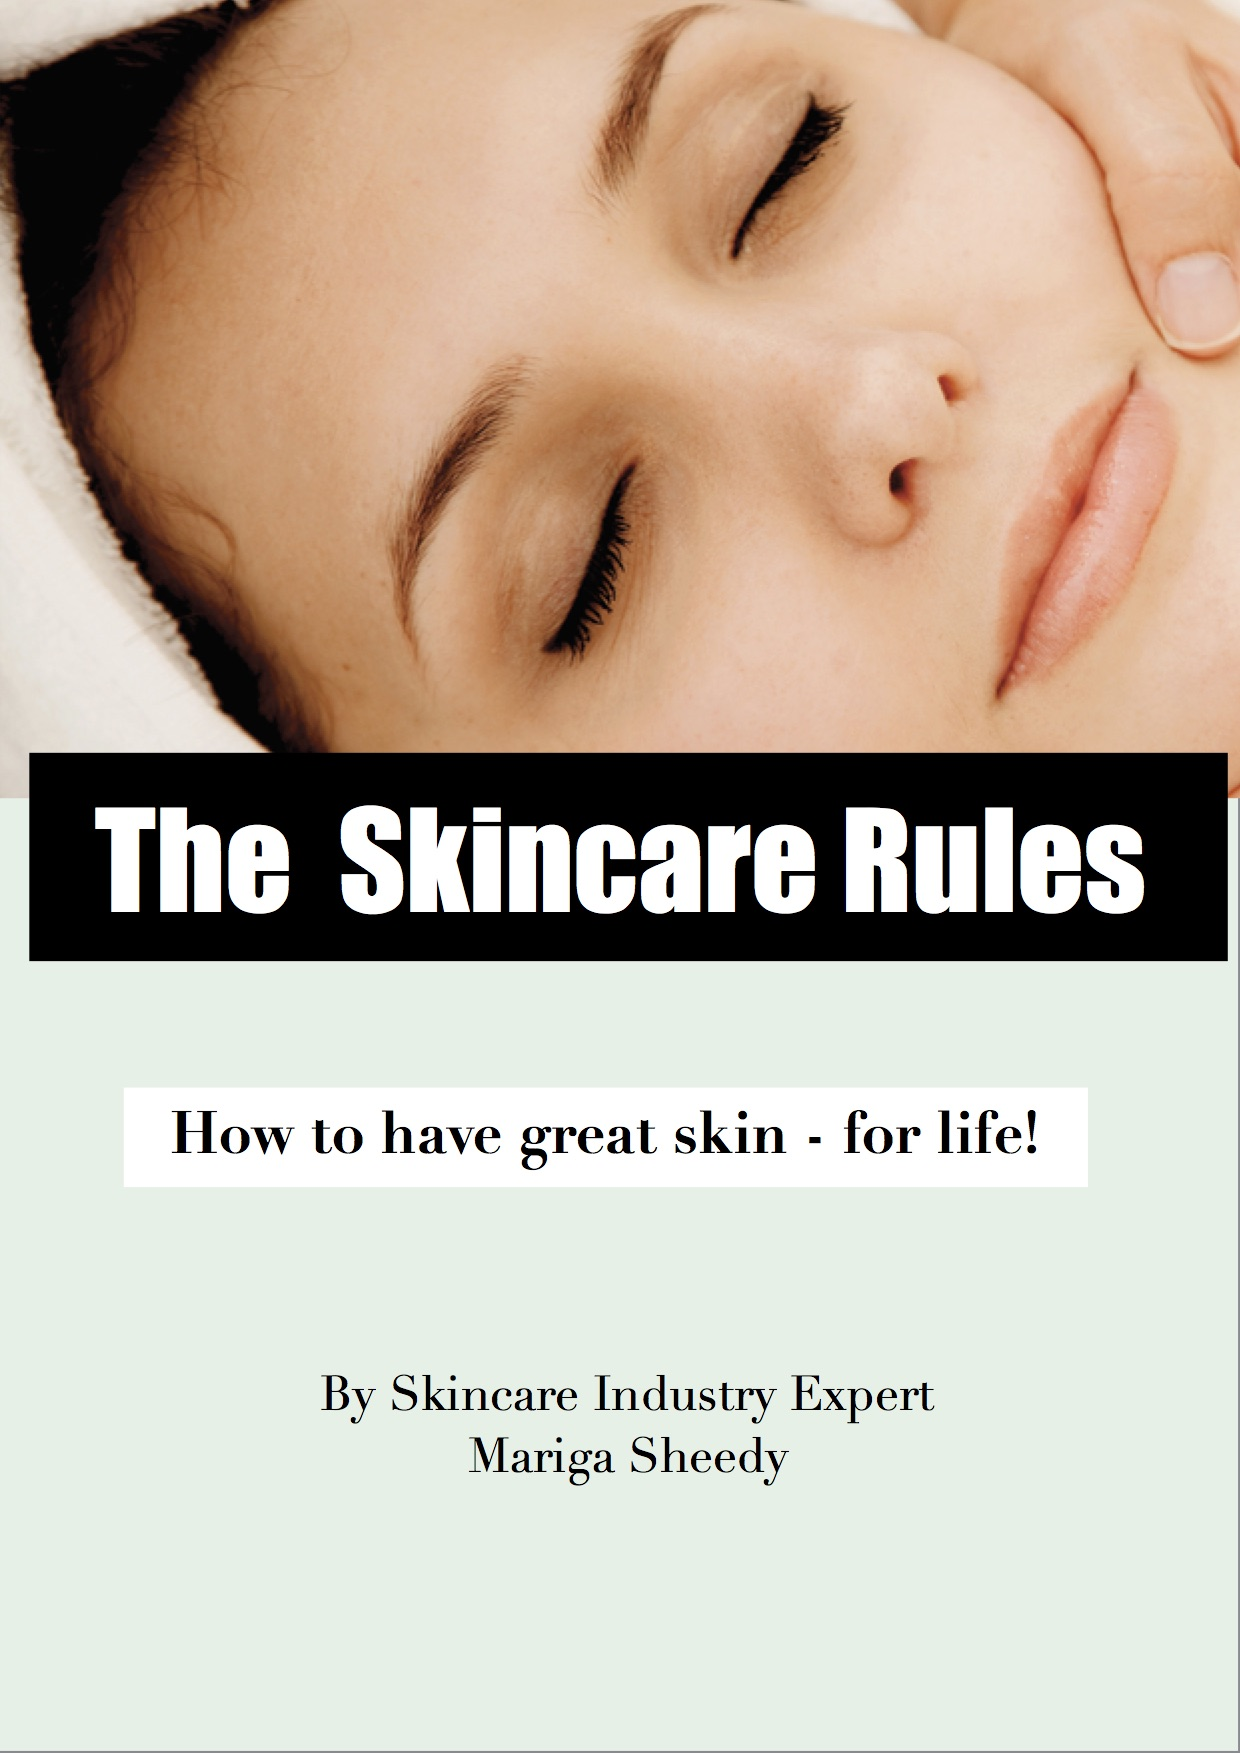 http://www.amazon.co.uk/Skincare-Rules-have-great-skin-ebook/dp/B01CAHUSS4/ref=sr_1_1?ie=UTF8&qid=1456916675&sr=8-1&keywords=mariga+sheedy